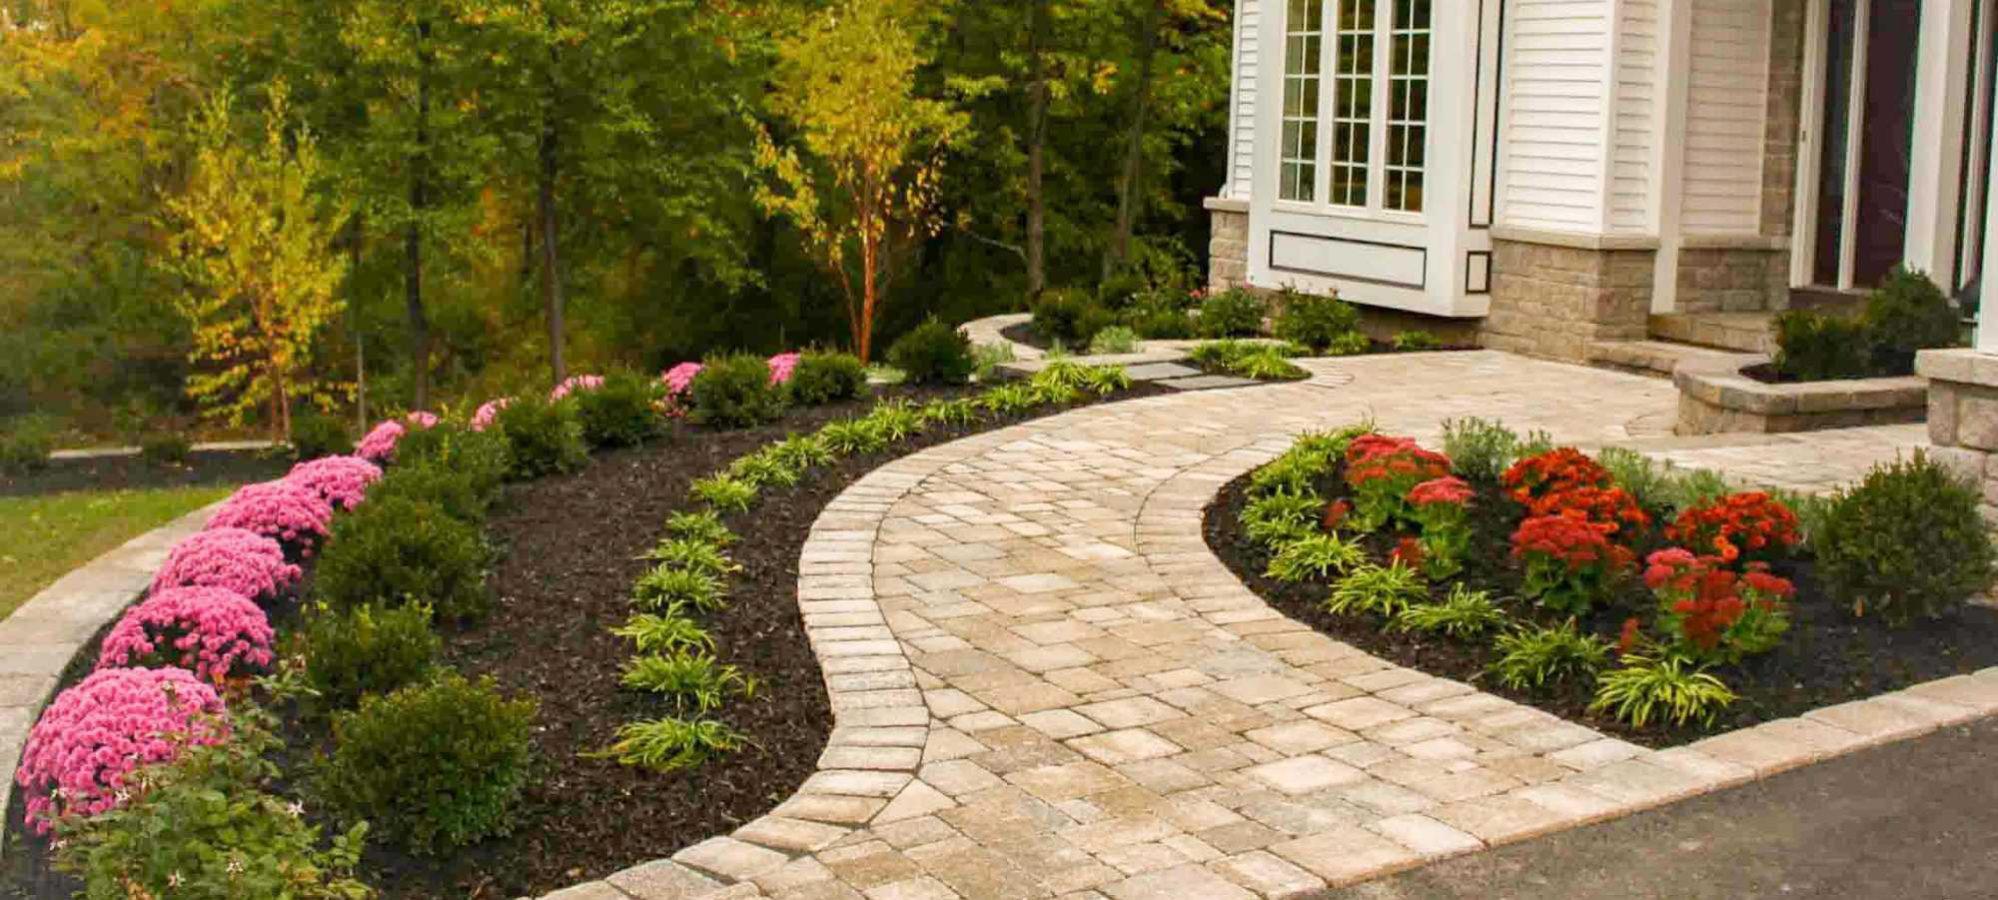 bountiful-landscaping-ideas